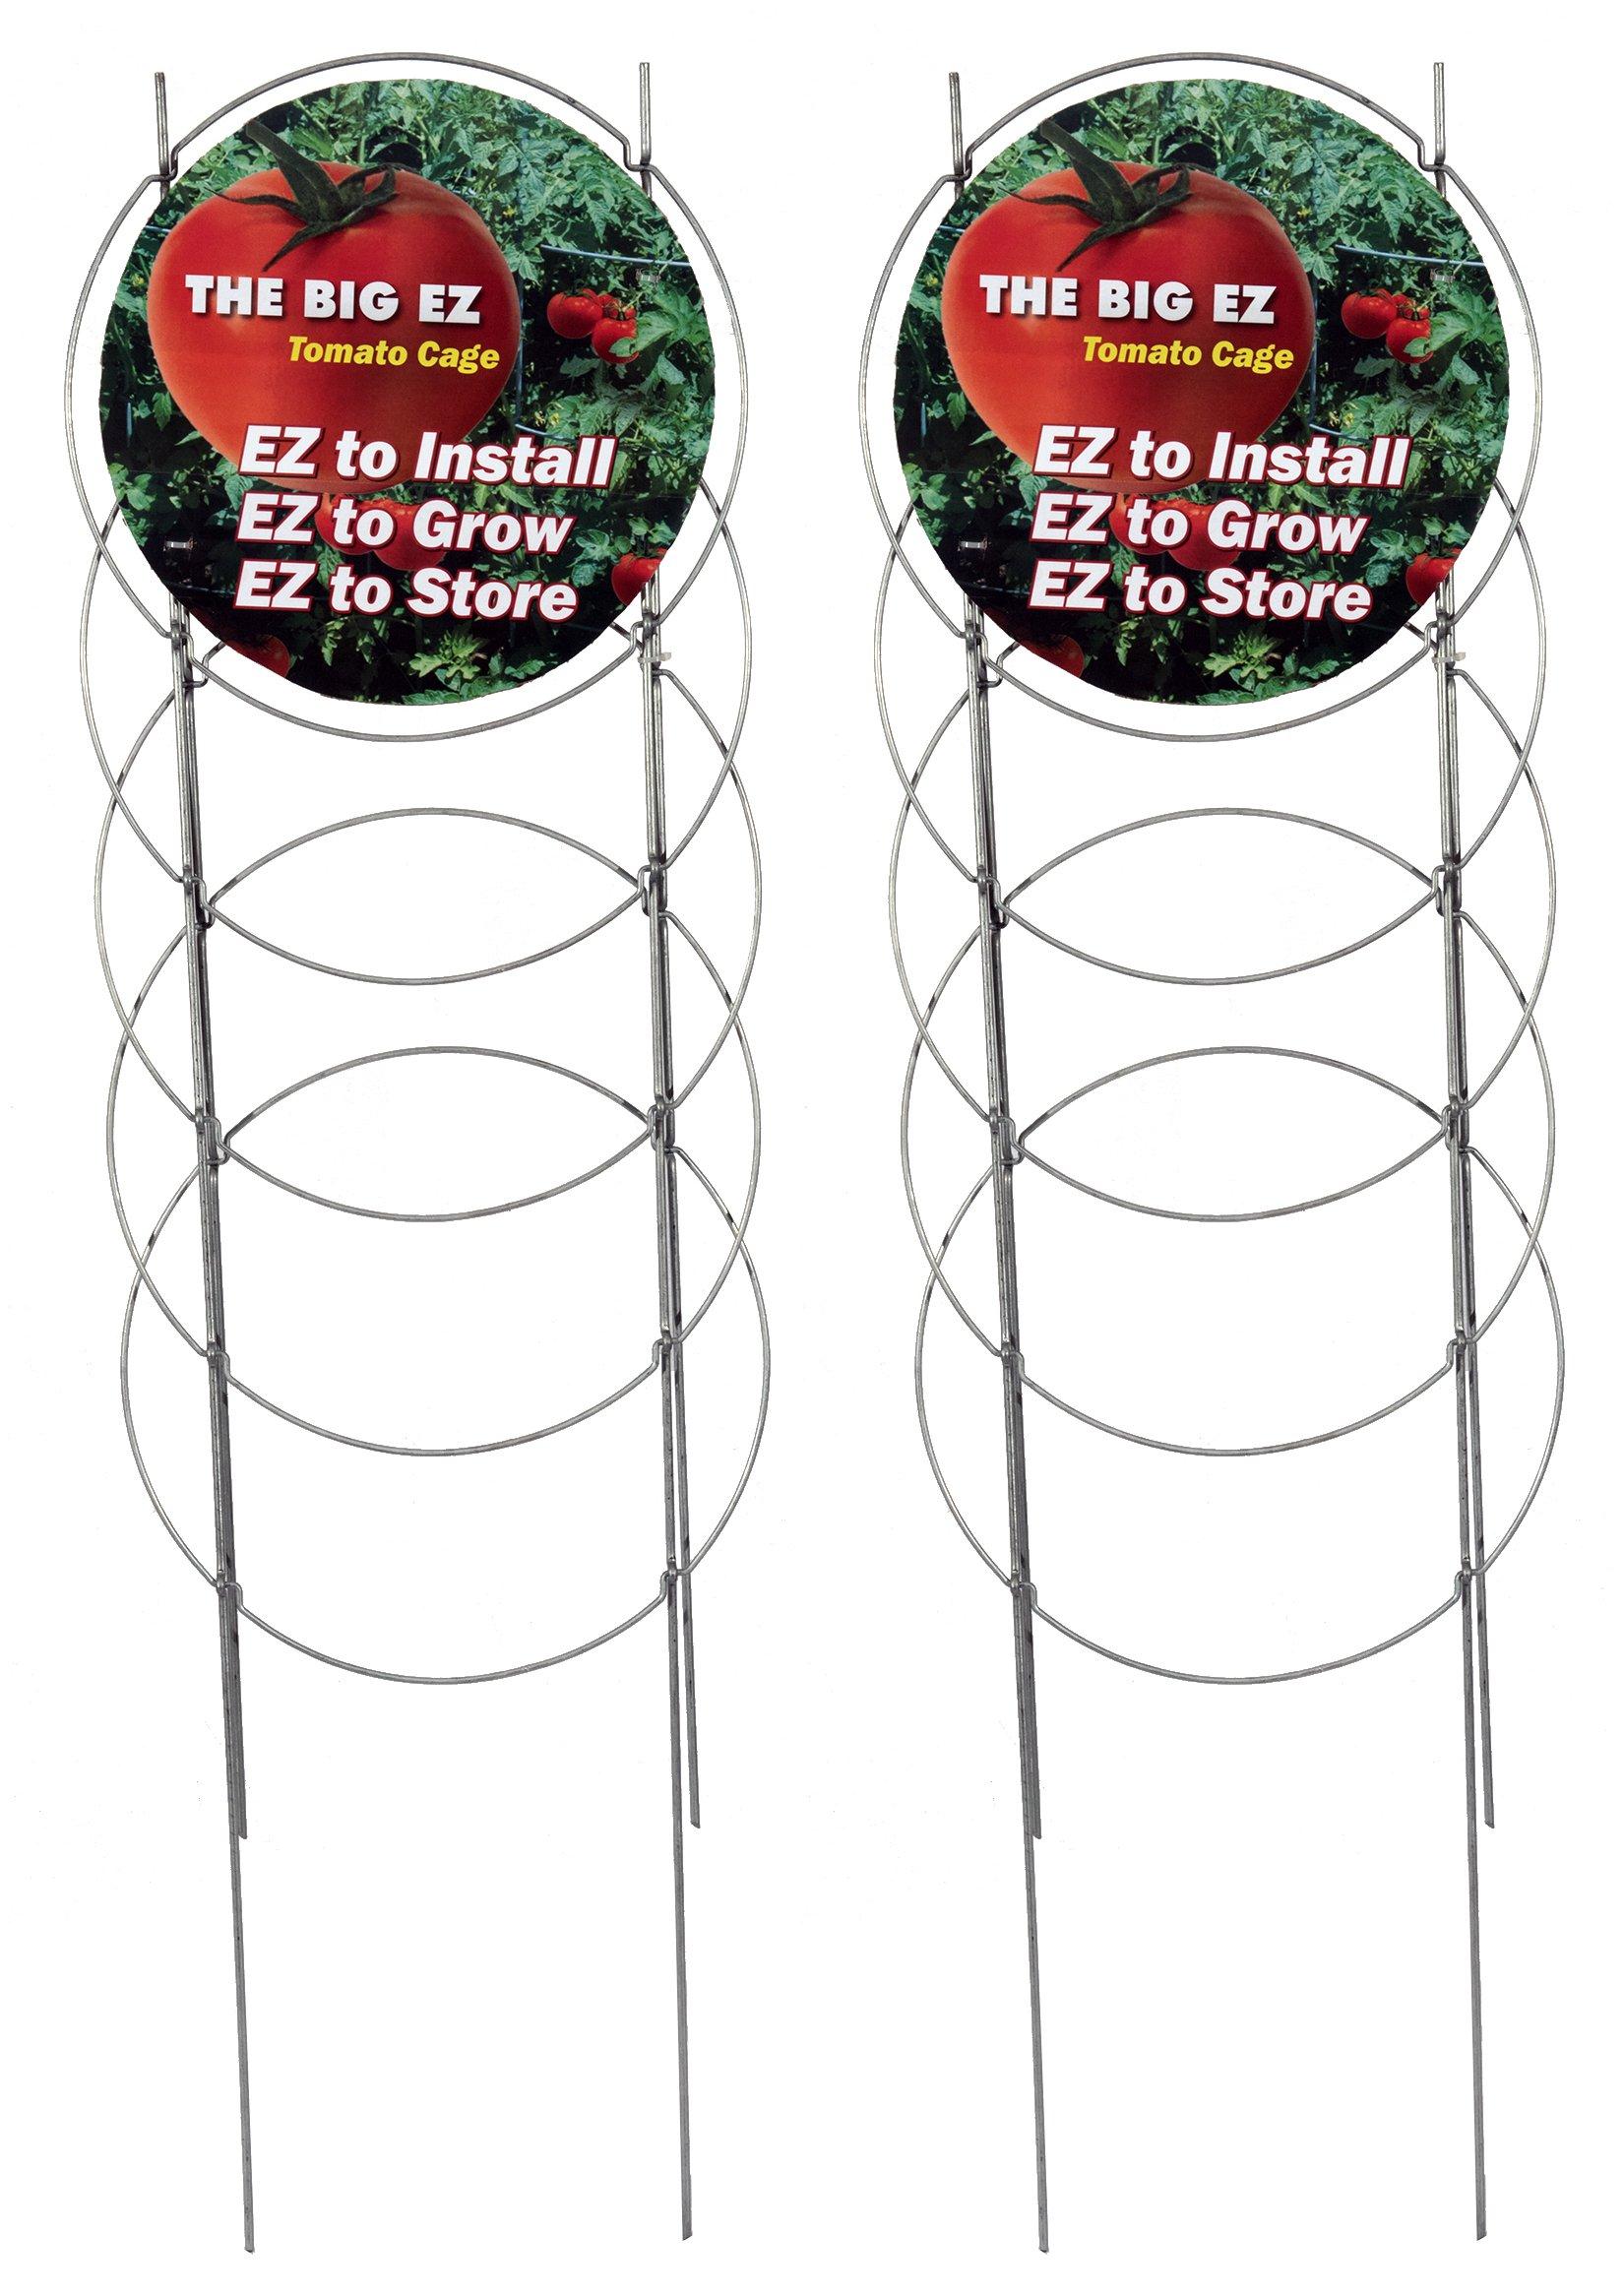 Dasco Pro EZ Grow TC-4 The Big EZ Heavy Duty Folding Tomato Cage and Plant Support, 2 Pack, White